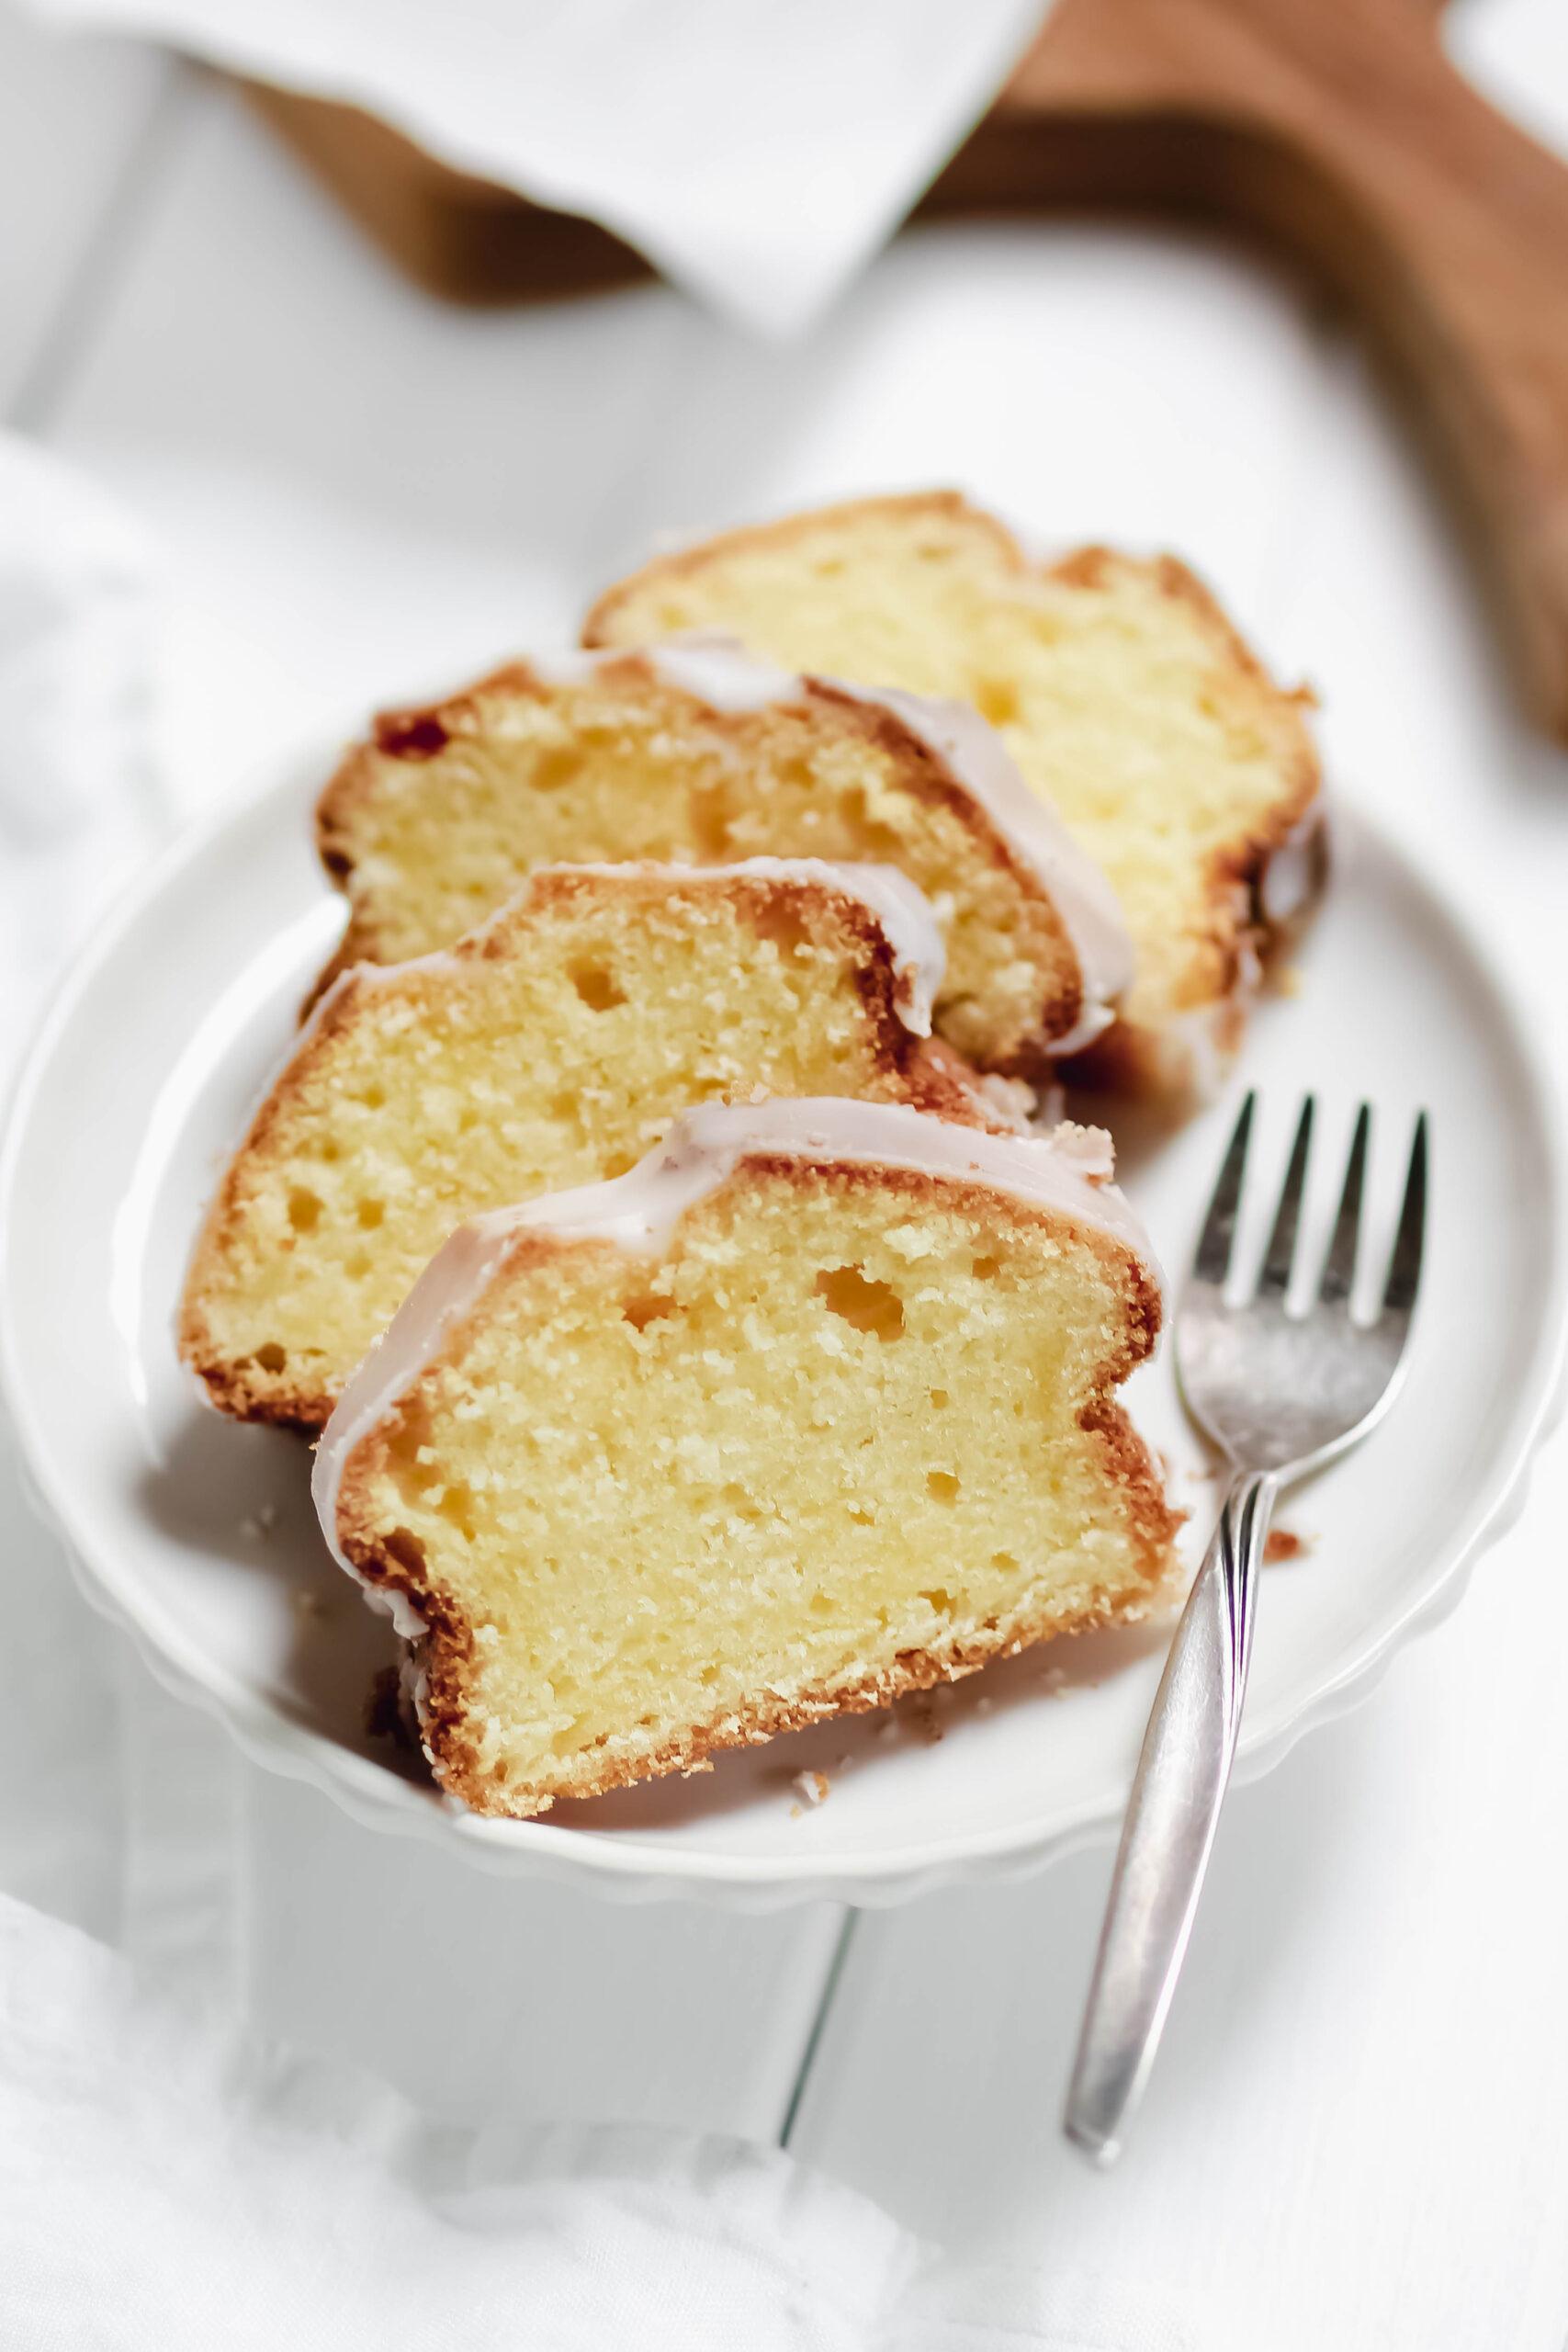 easy peasy lemon squeezy – saftiger Zitronenkuchen